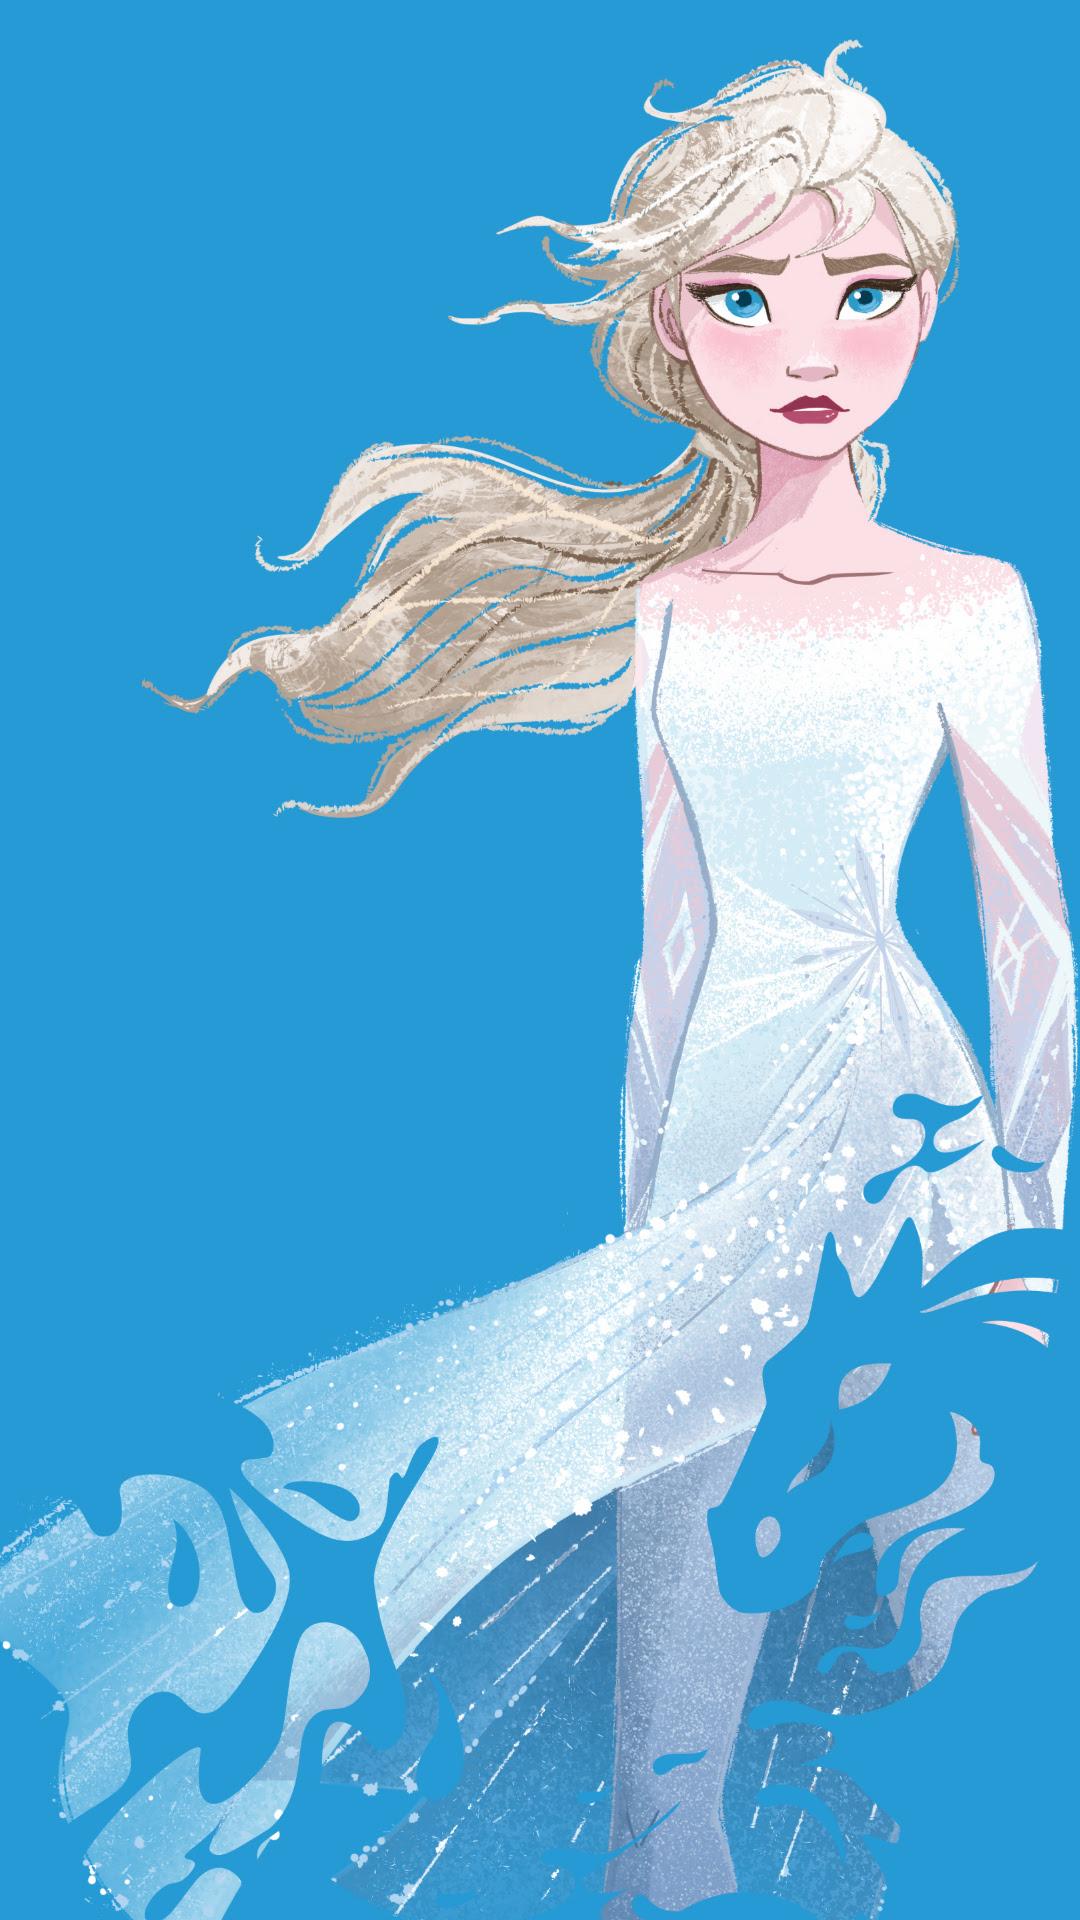 Frozen 2 Elsa Phone Wallpaper Elsa And Anna Photo 43116020